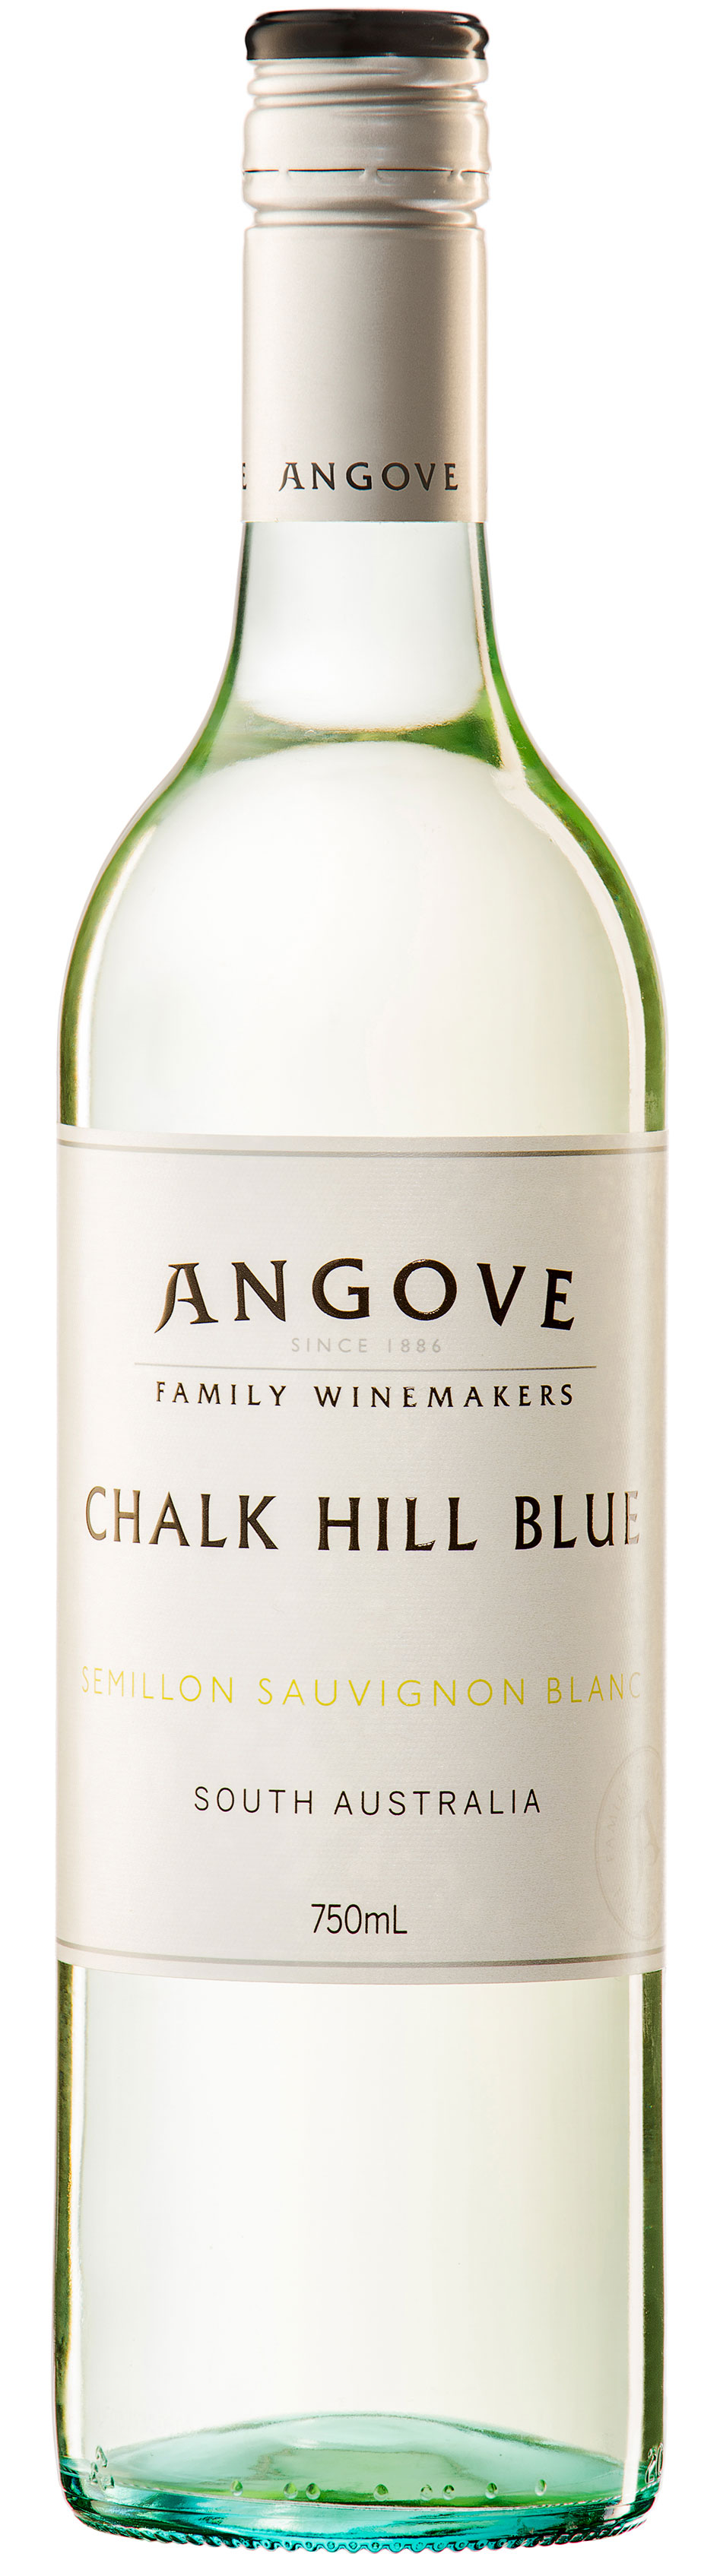 https://vinocorpperu.com/images/vinos/angove/chalk_hill_blue_2019.jpg